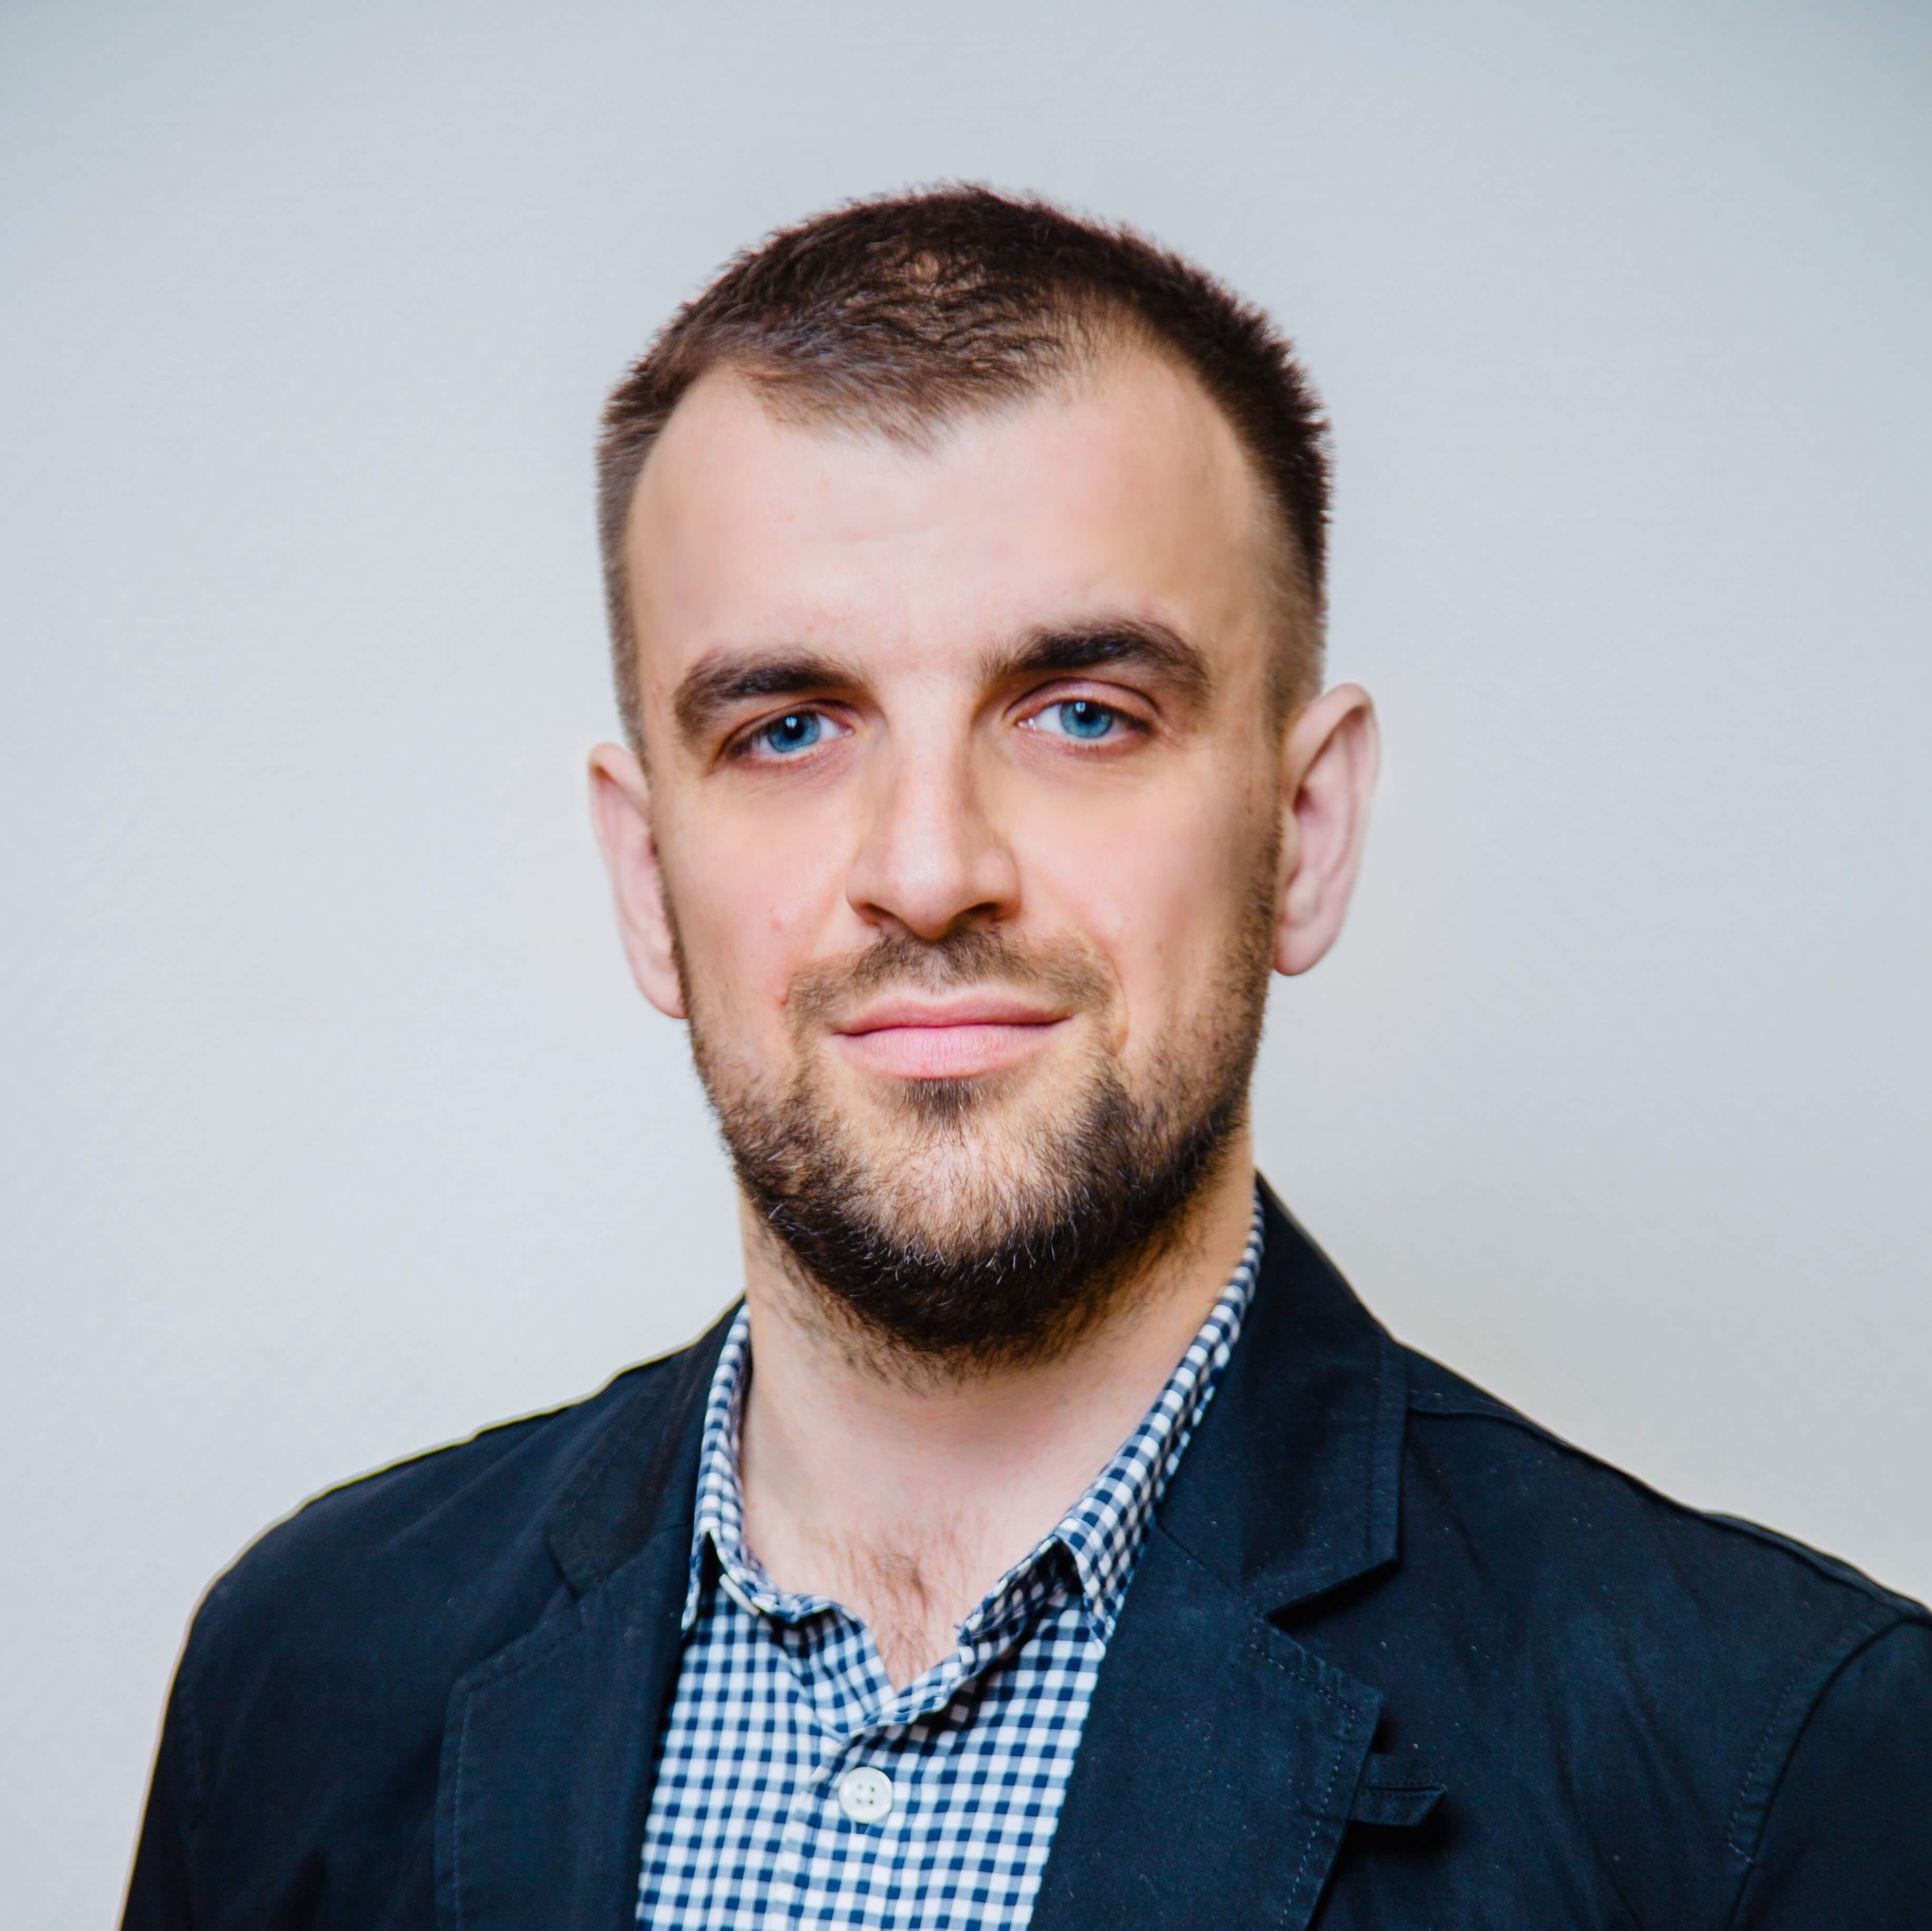 Киселев Алексей Дмитриевич